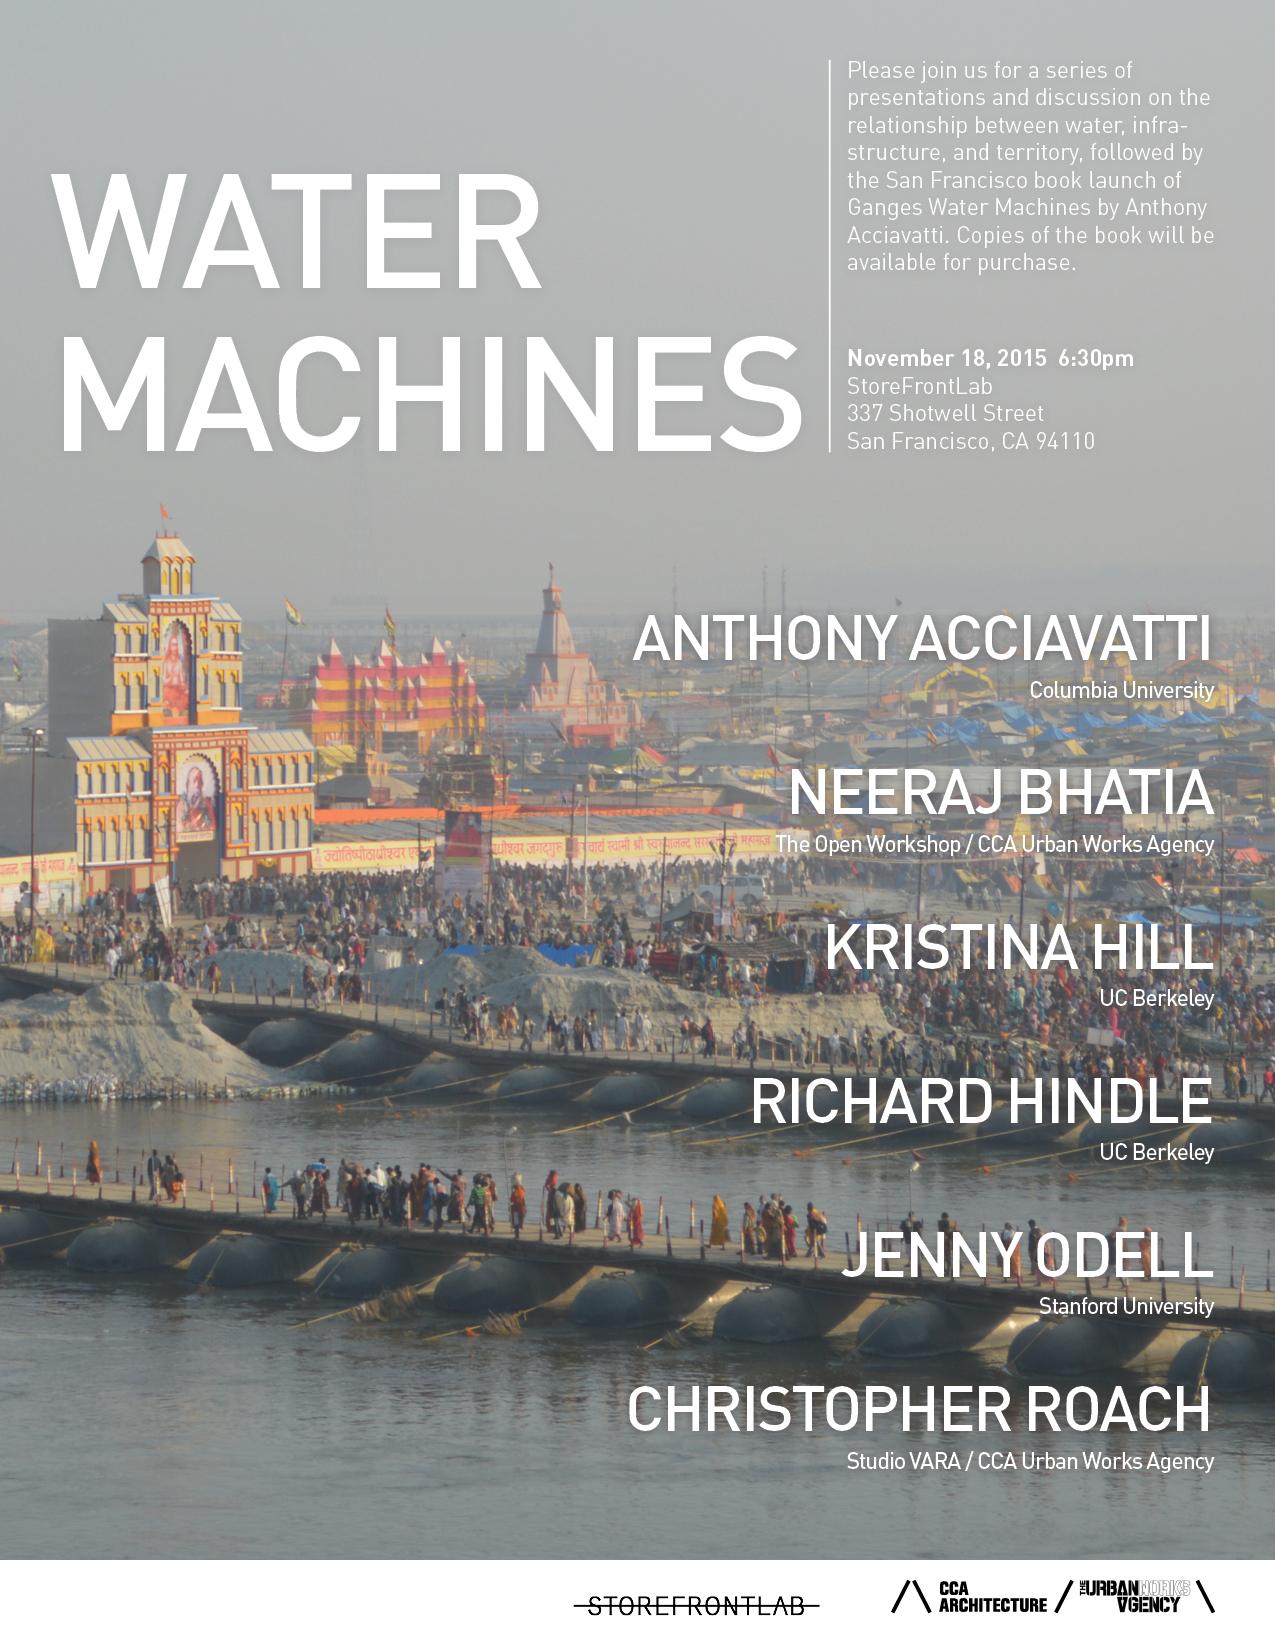 Water_Machines_poster_10_13_15_WEB1.jpg